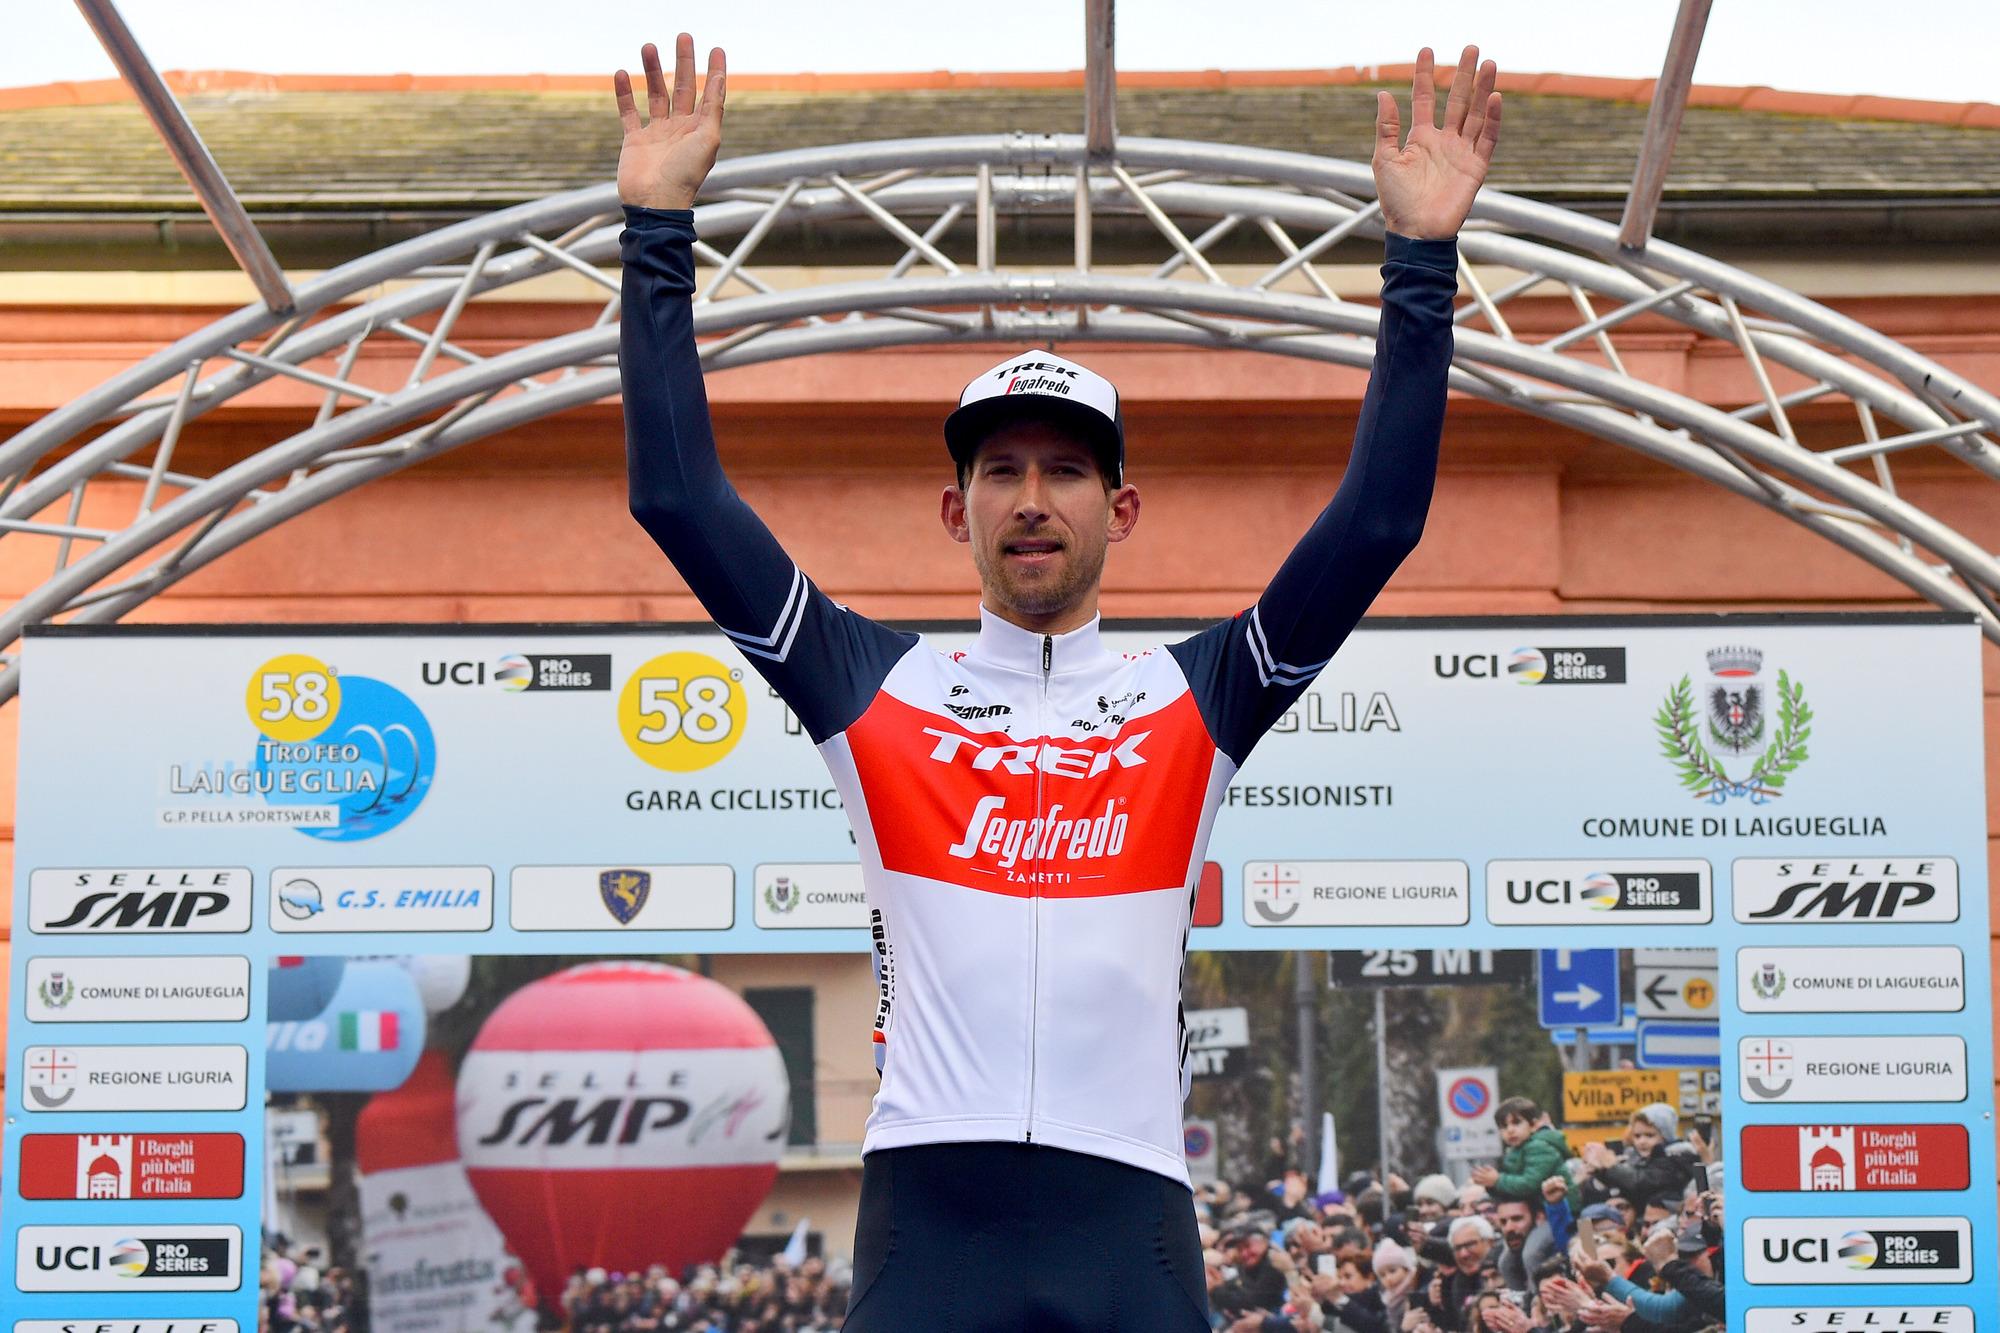 Trofeo Laigueglia 2021 58th Edition Laigueglia Laigueglia 202 km 03032021 Bauke Mollema NED Trek Segafredo photo Dario BelingheriBettiniPhoto2021